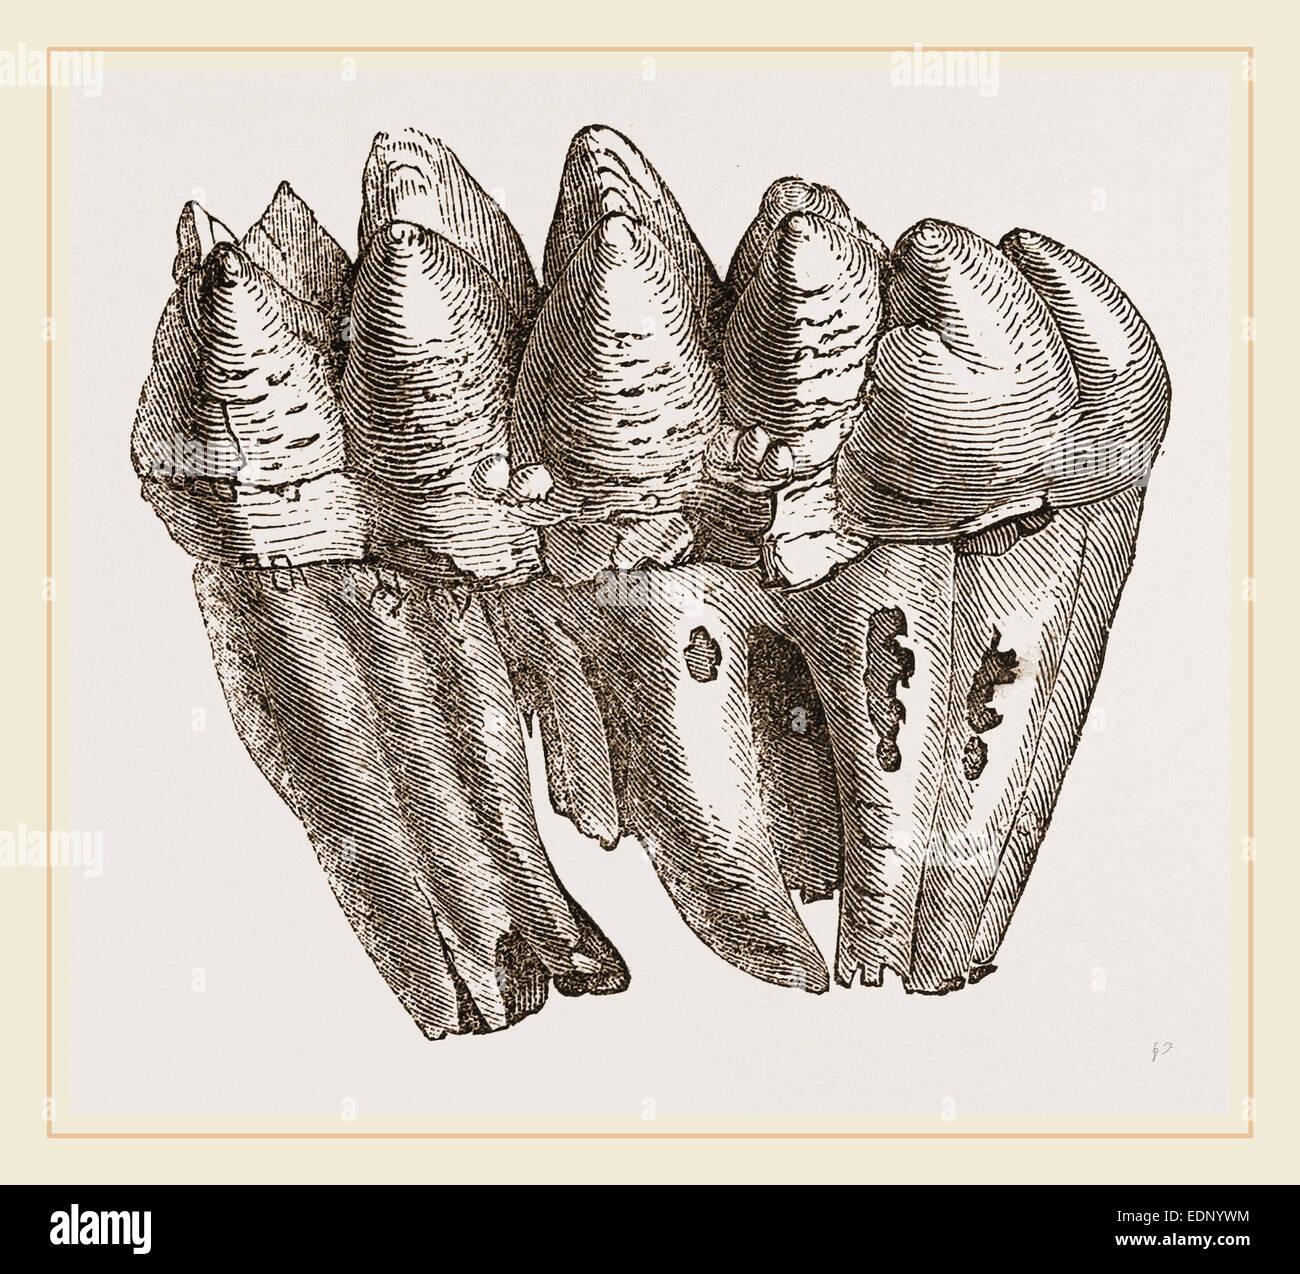 Molar of Mastodon not worn - Stock Image